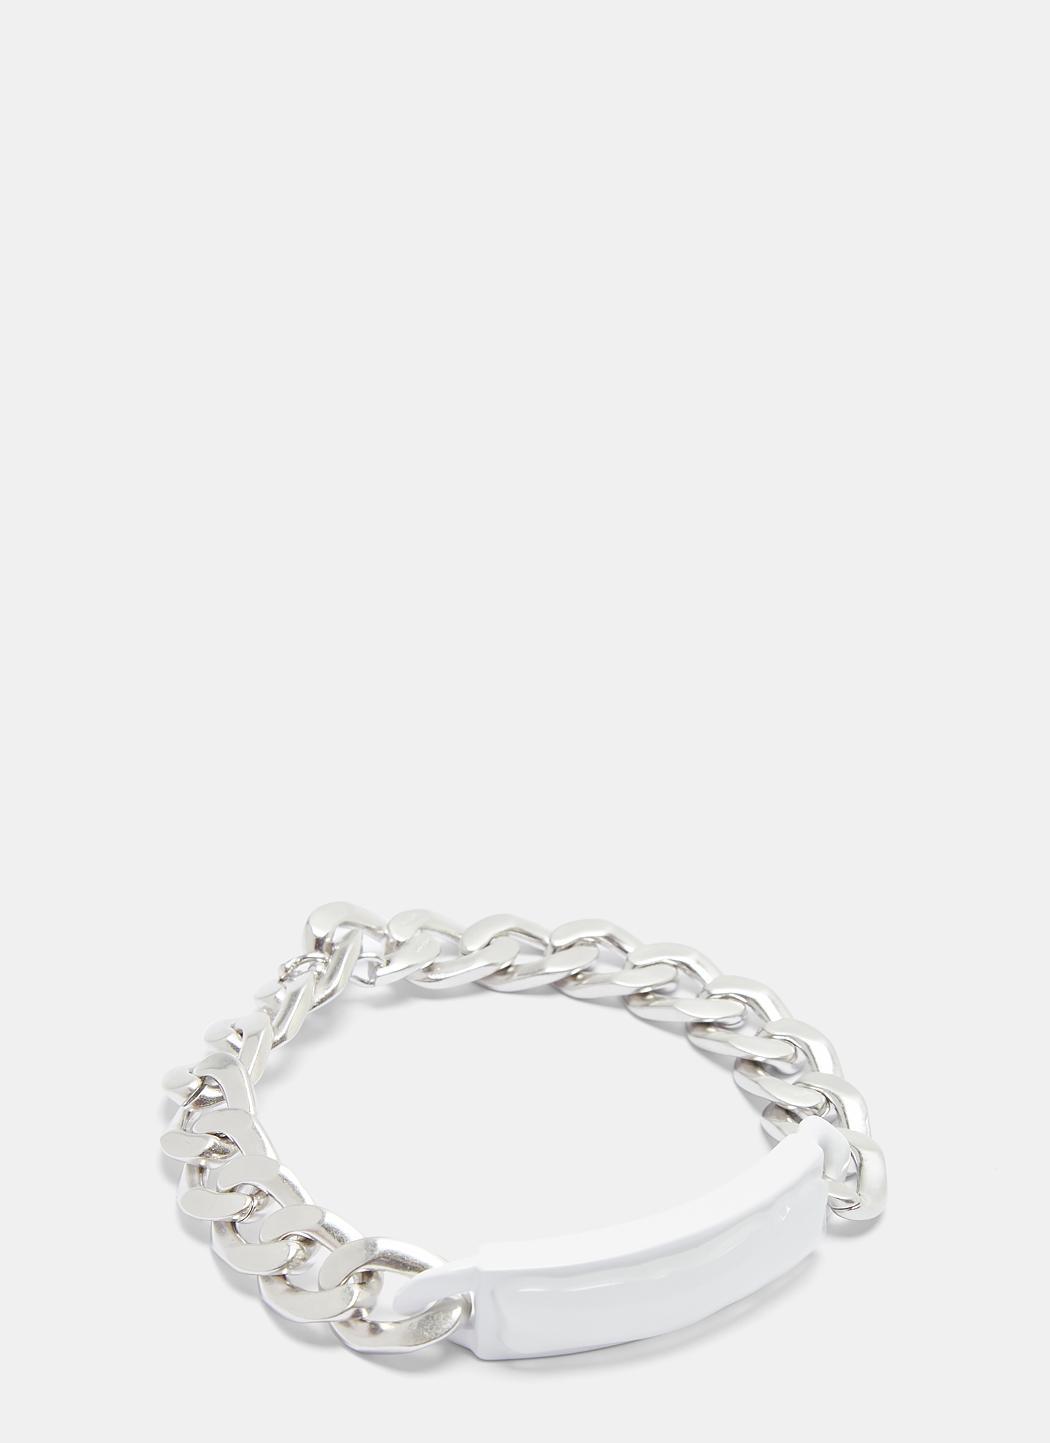 Maison Martin Margiela Anonymous ID bracelet - Metallic mO6eT7e